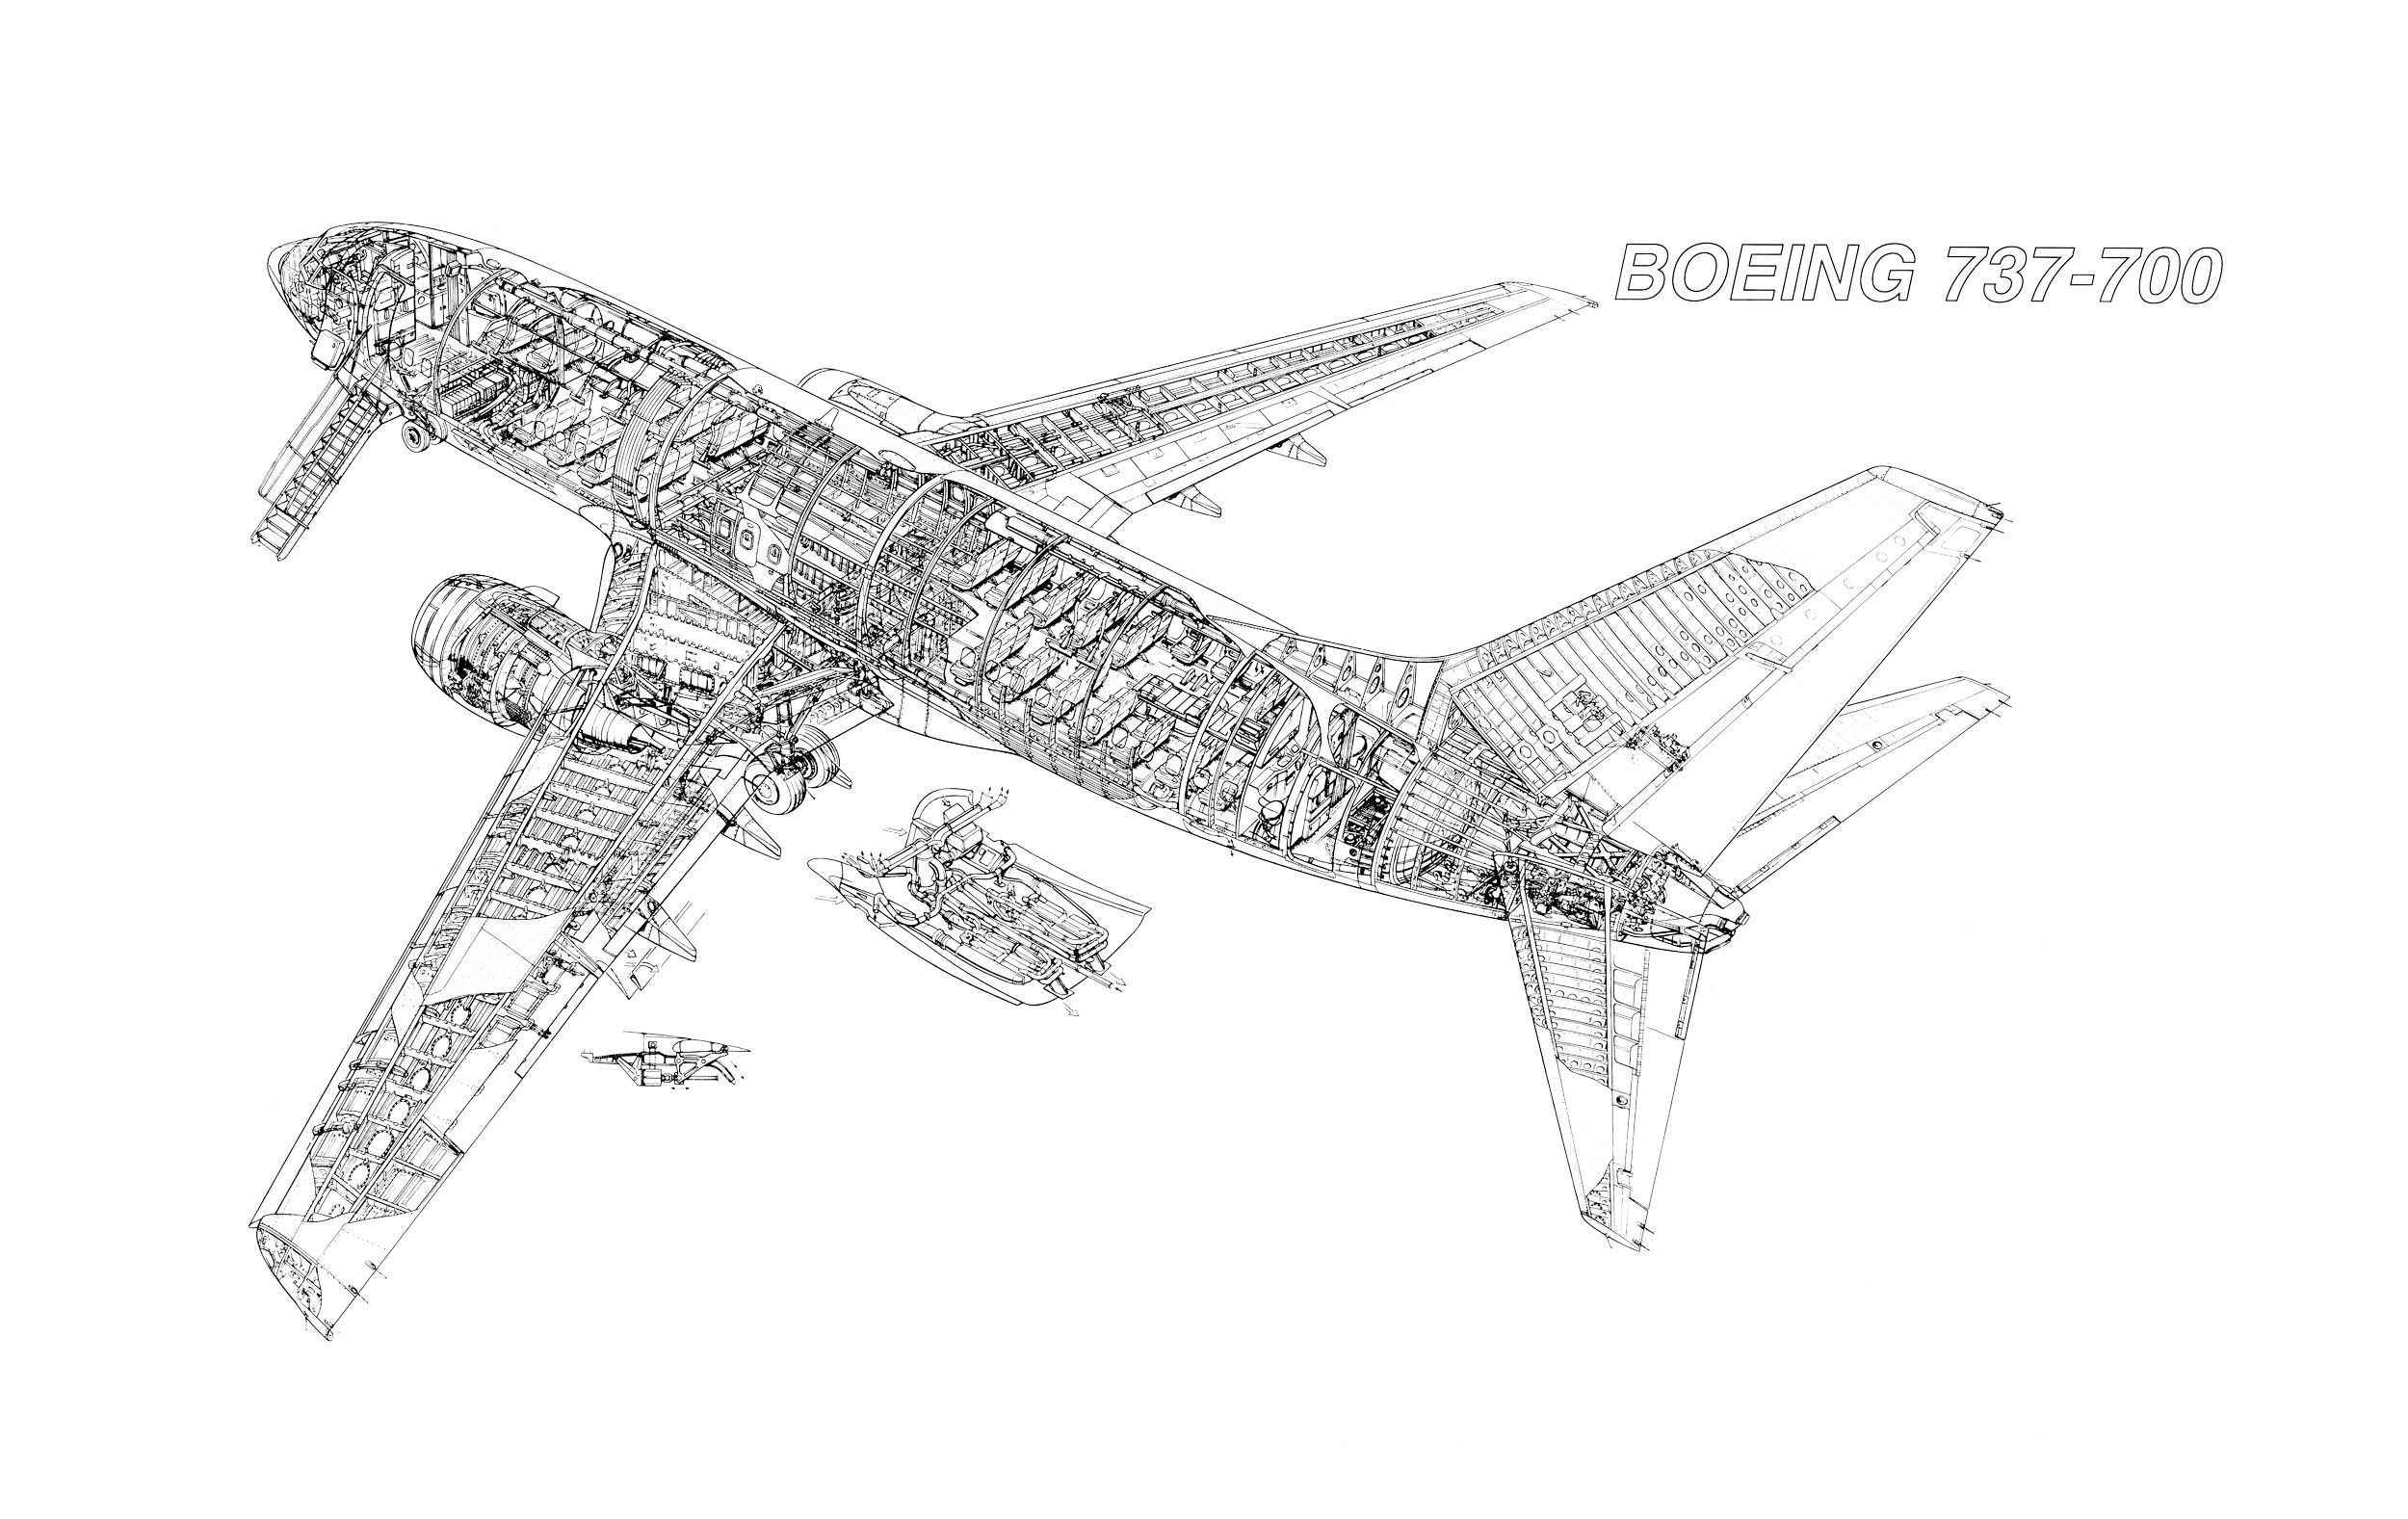 737 fuselage diagram boeing 737-700 cutaway | aerospace cutaways and diagrams ... #7